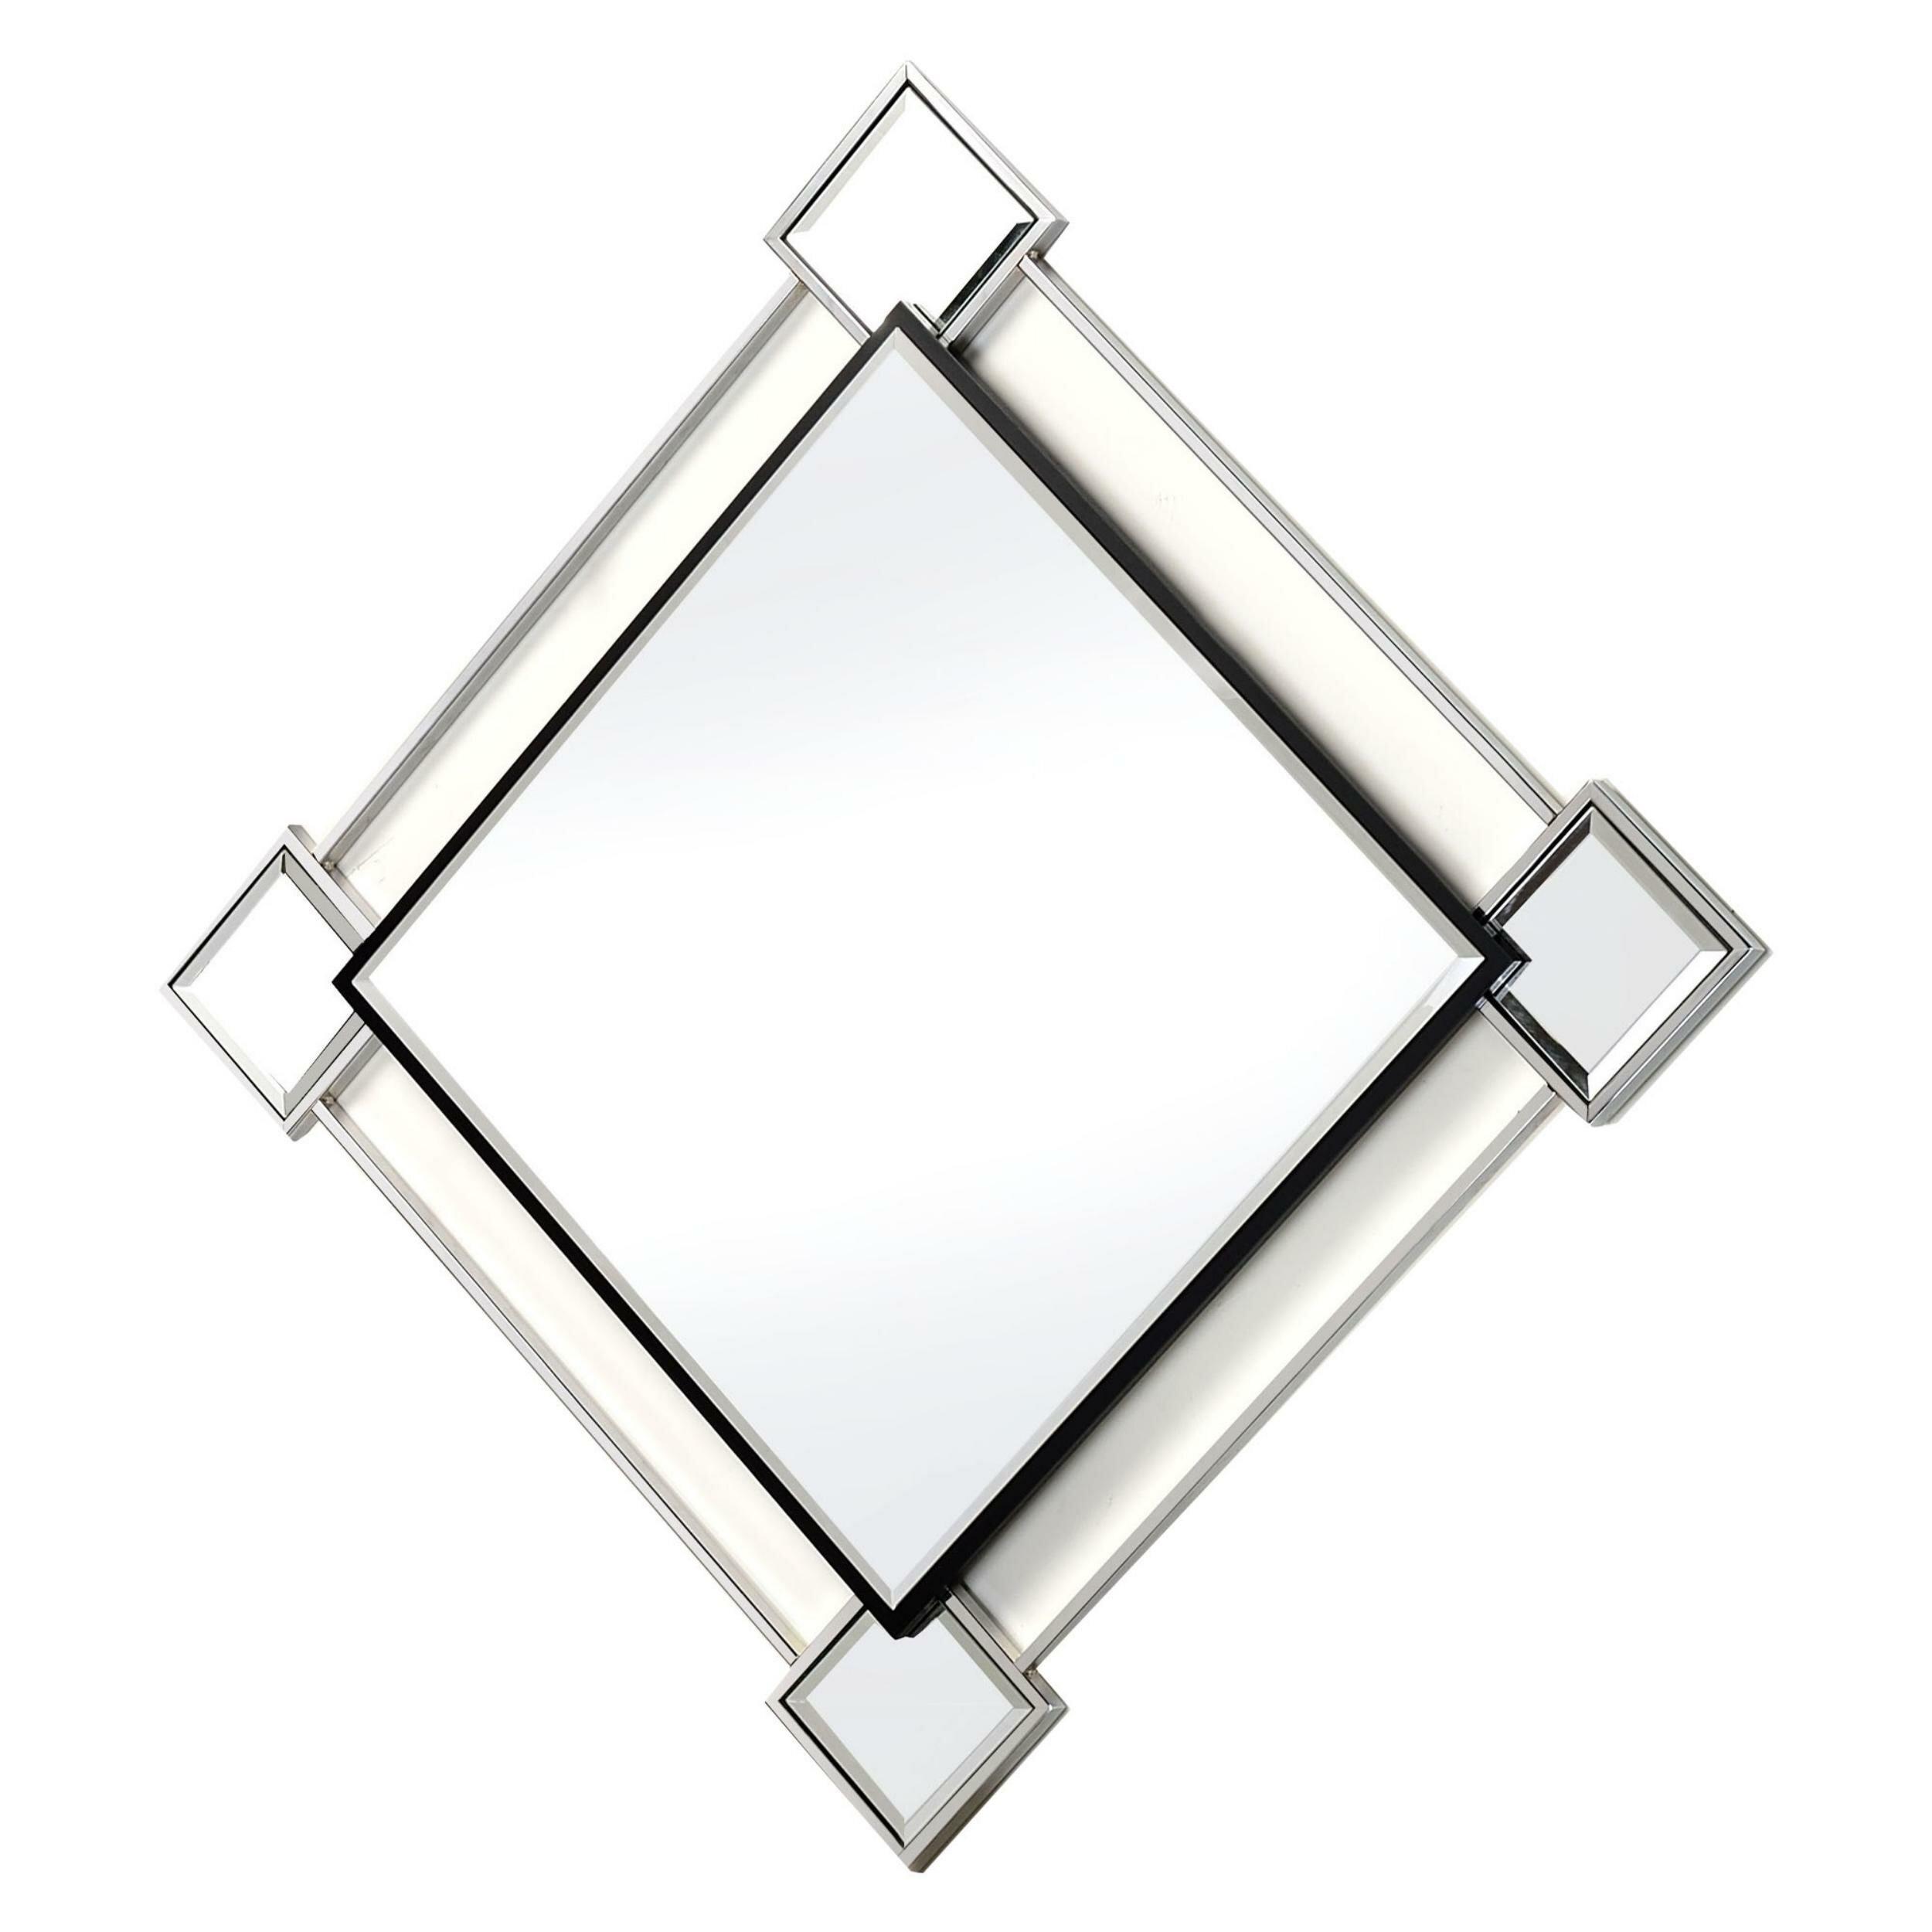 Orren Ellis Ventana Diamond Shaped Modern Beveled Accent Mirror Wayfair